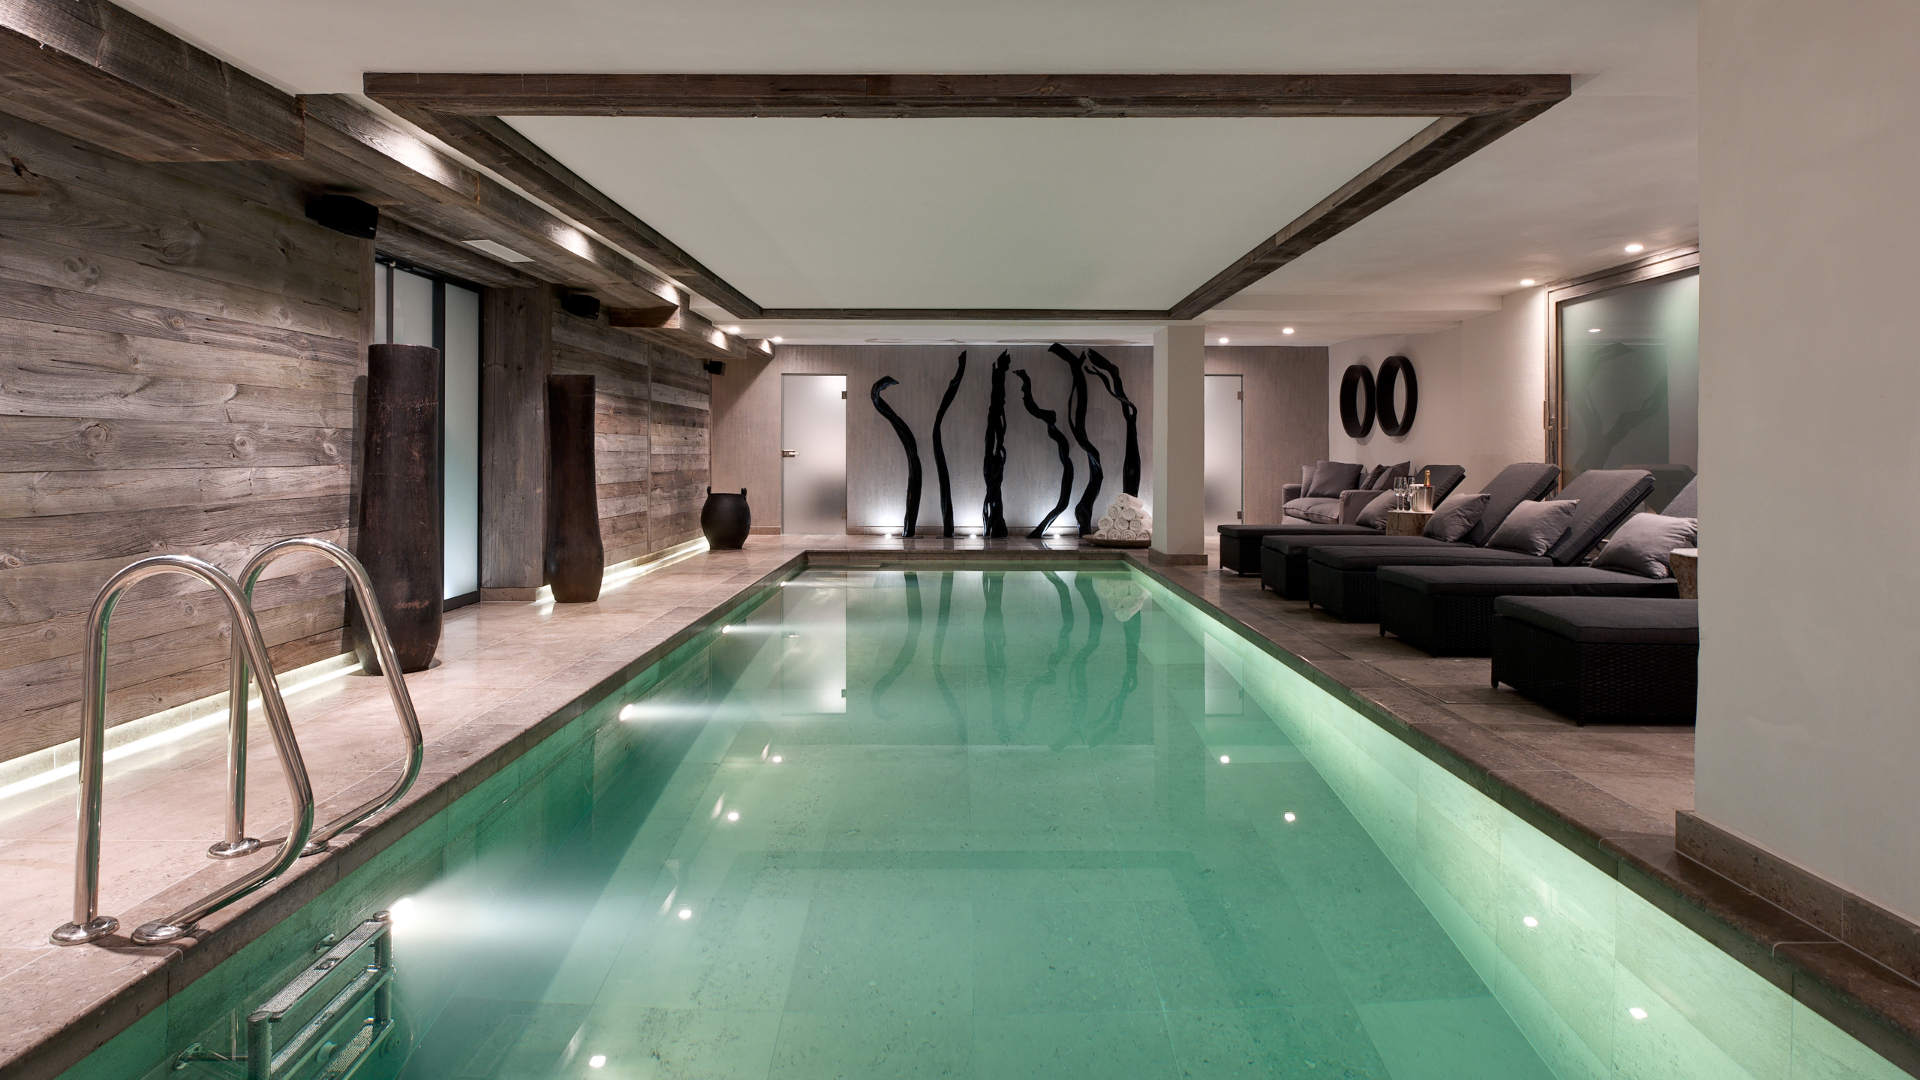 no-14-swimming-pool-3